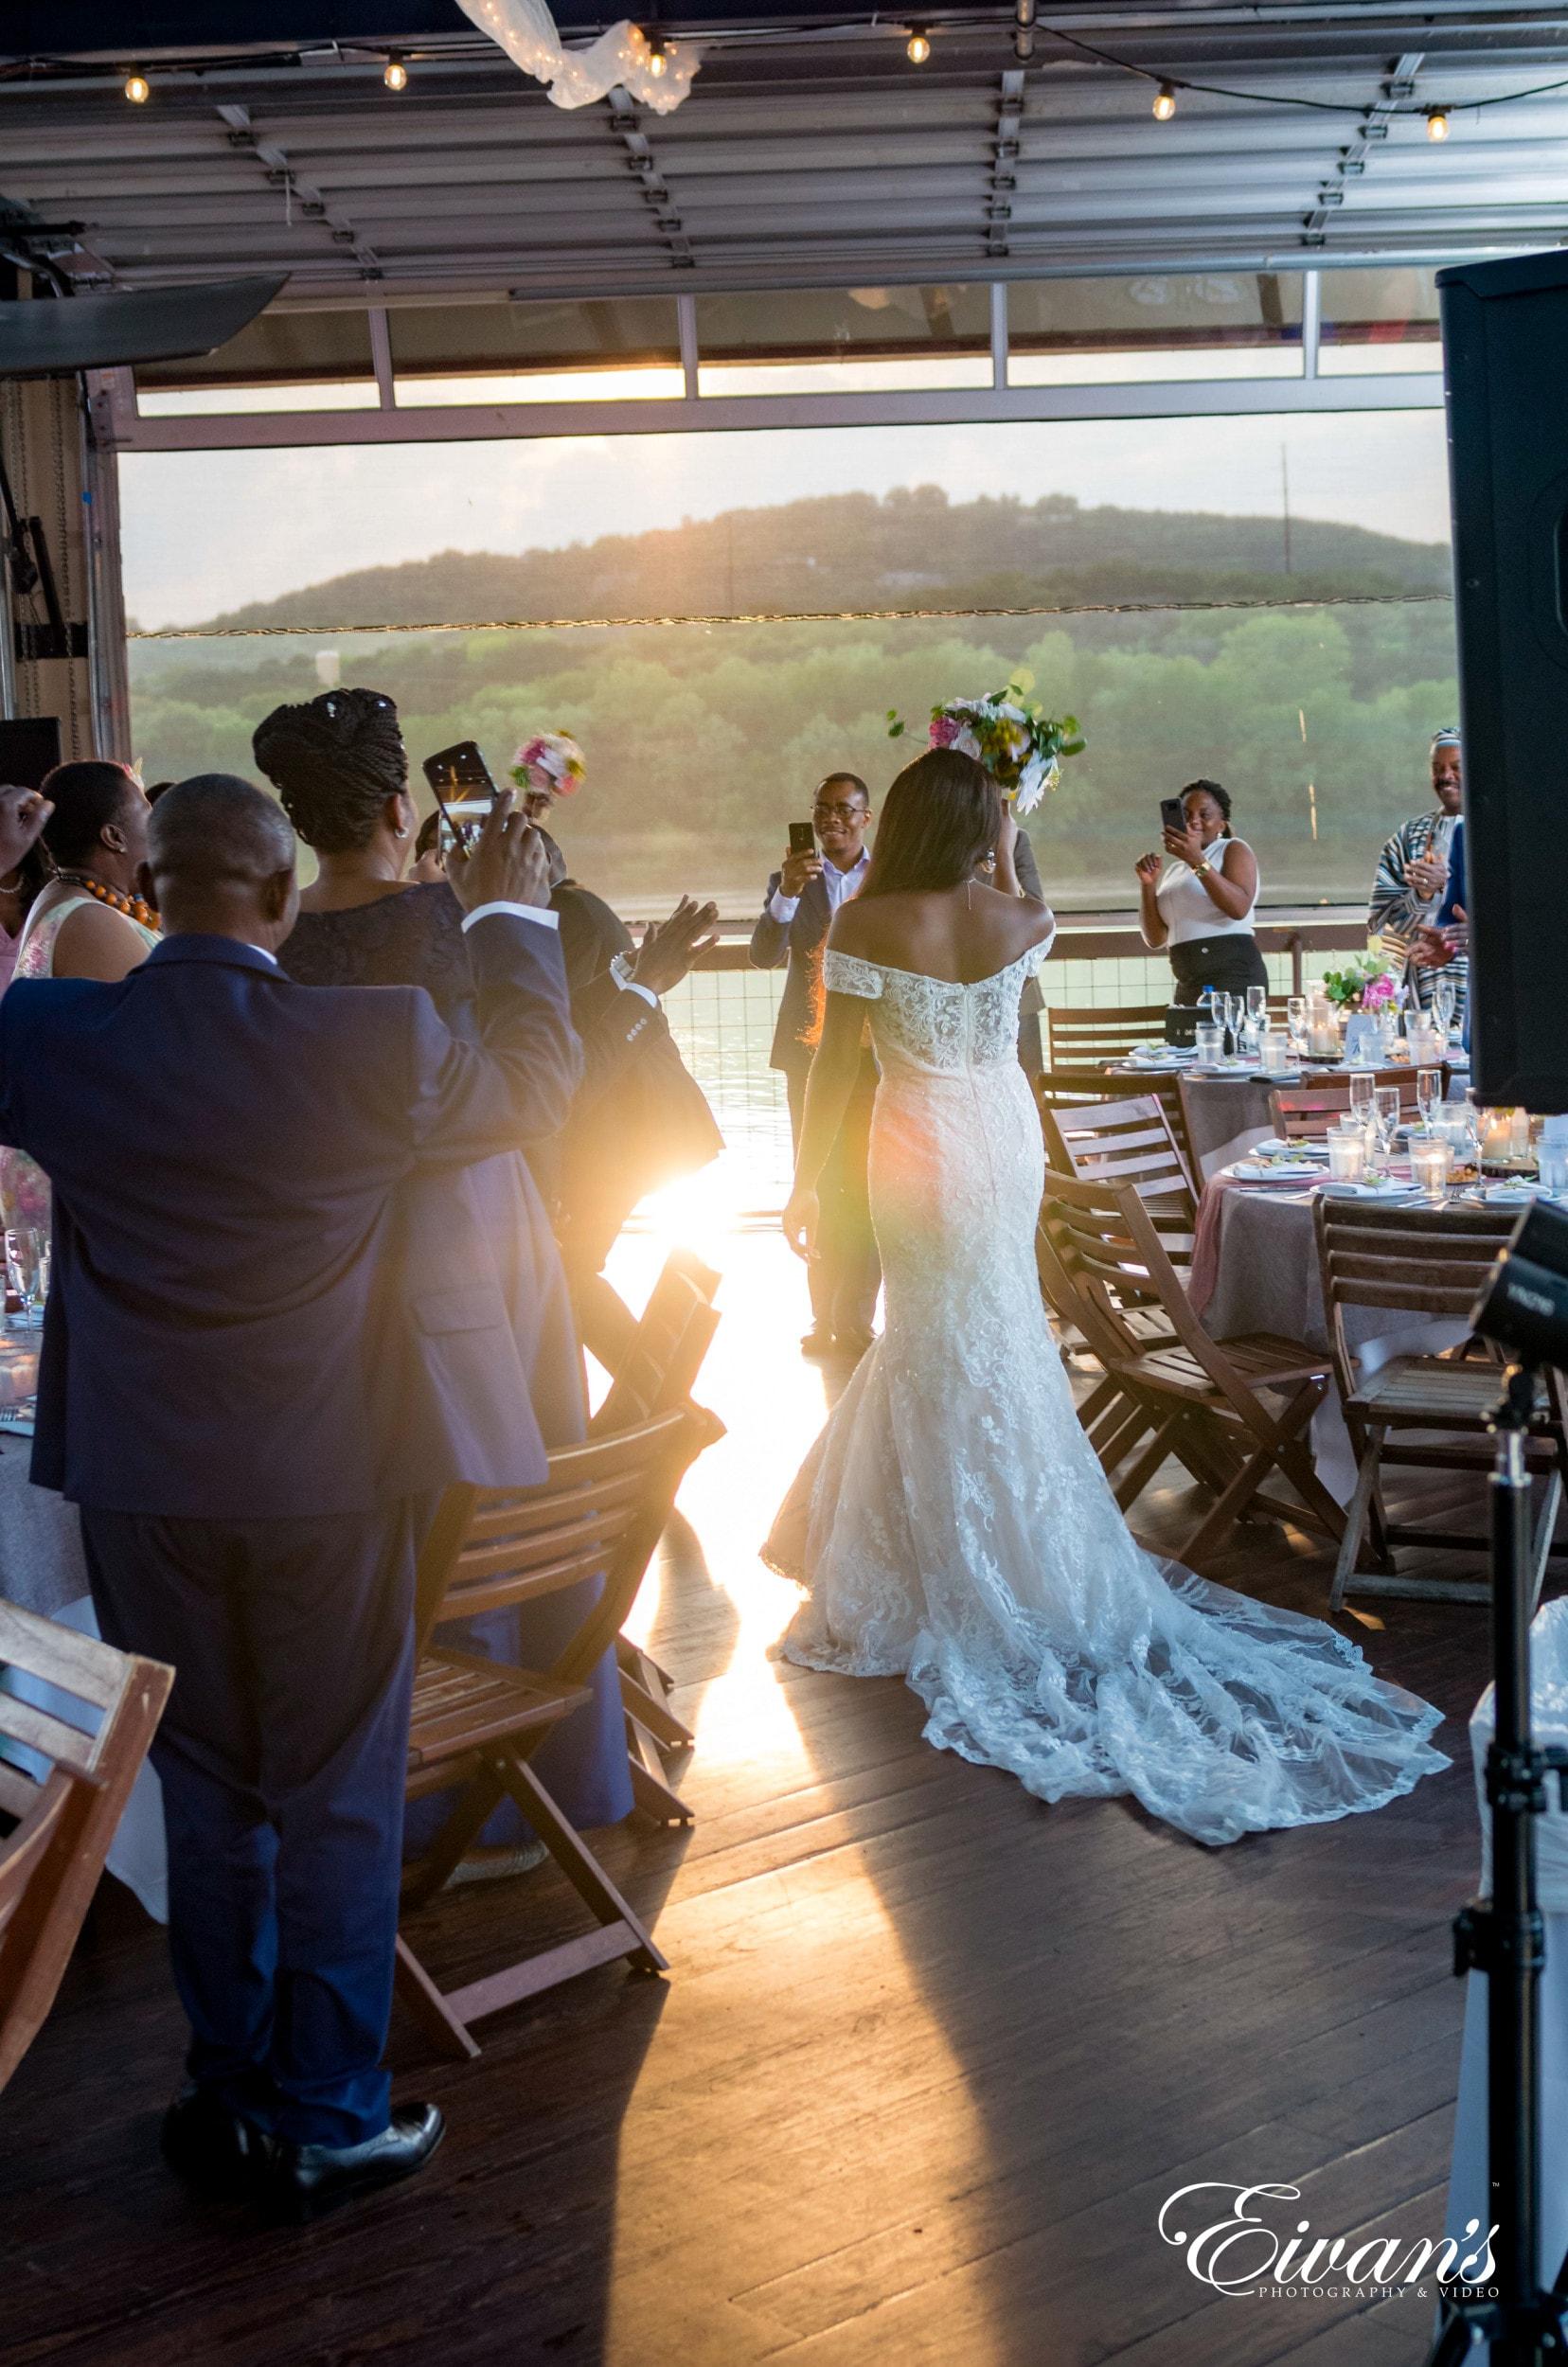 10 Fun Ideas To Make Your Small Wedding Still A Flair Eivan S Photo Inc